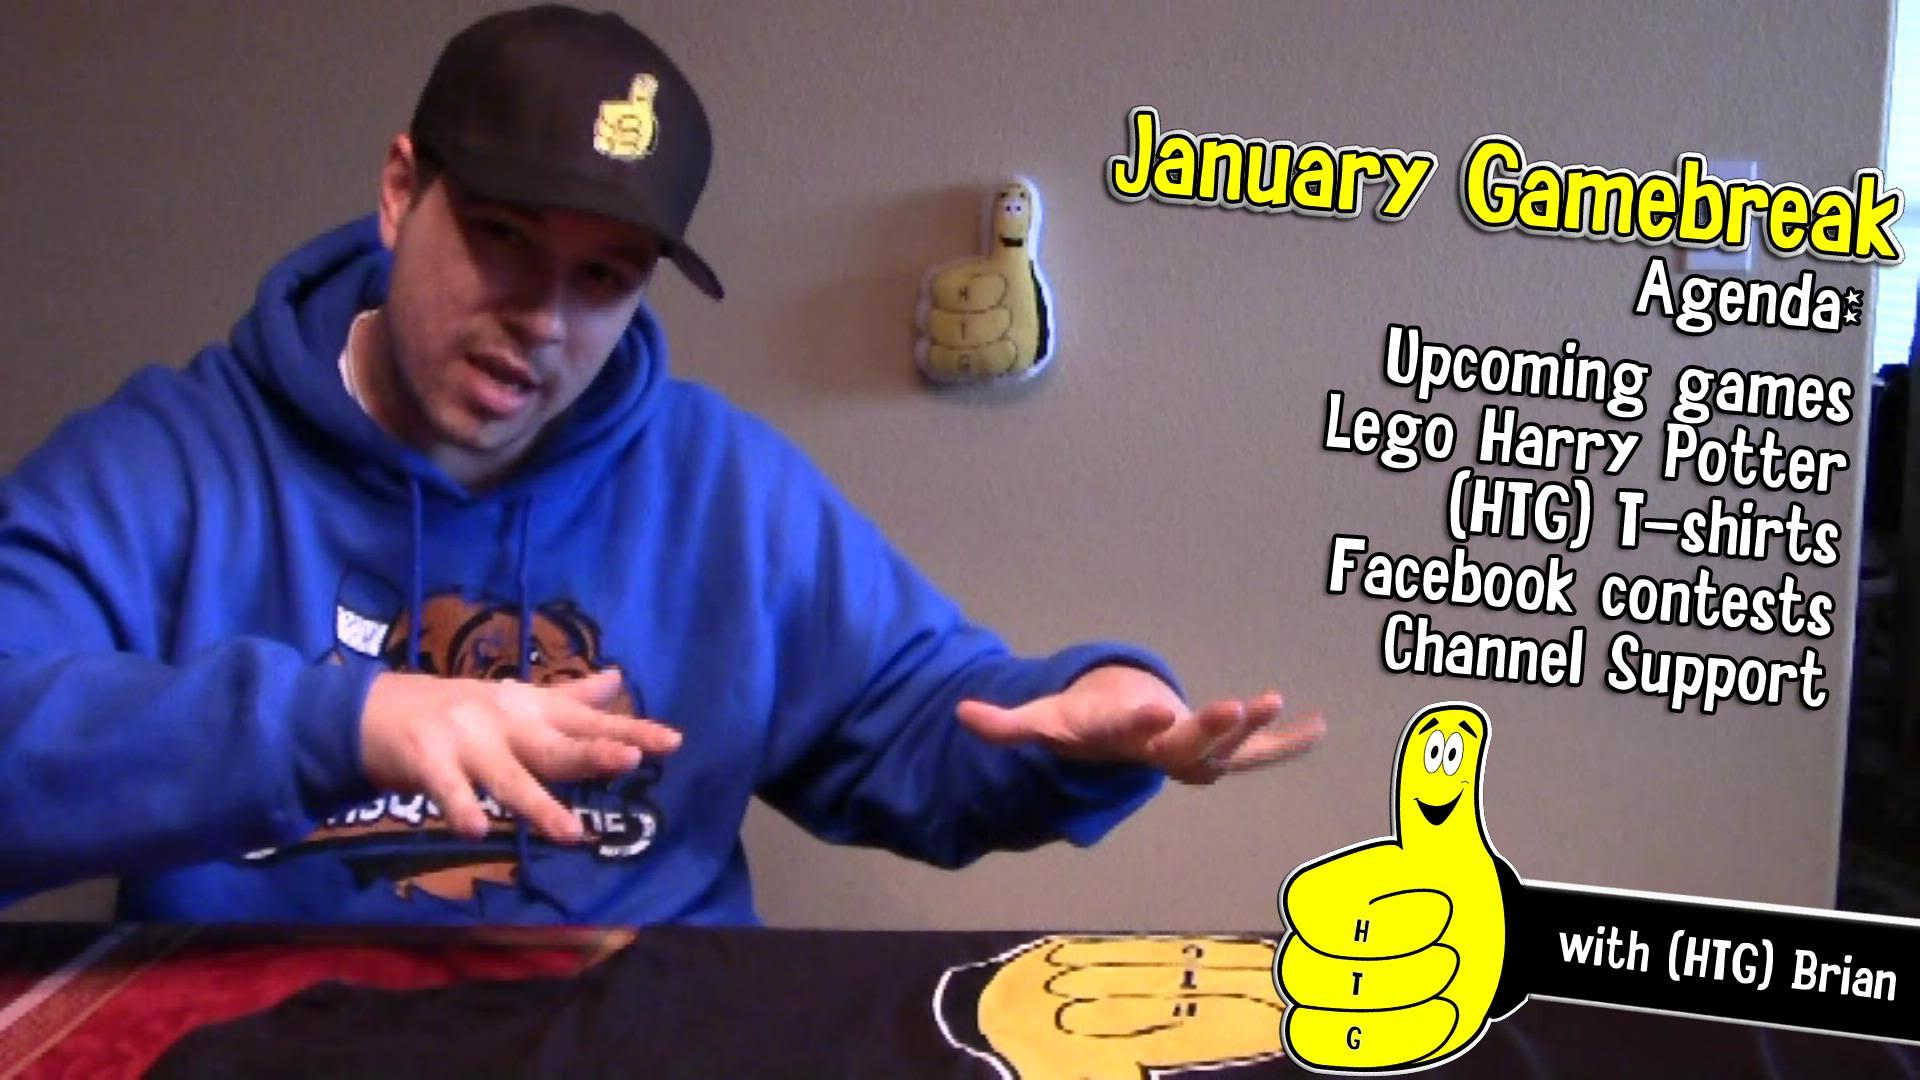 Gamebreak: January 2015 with Brian – HTG